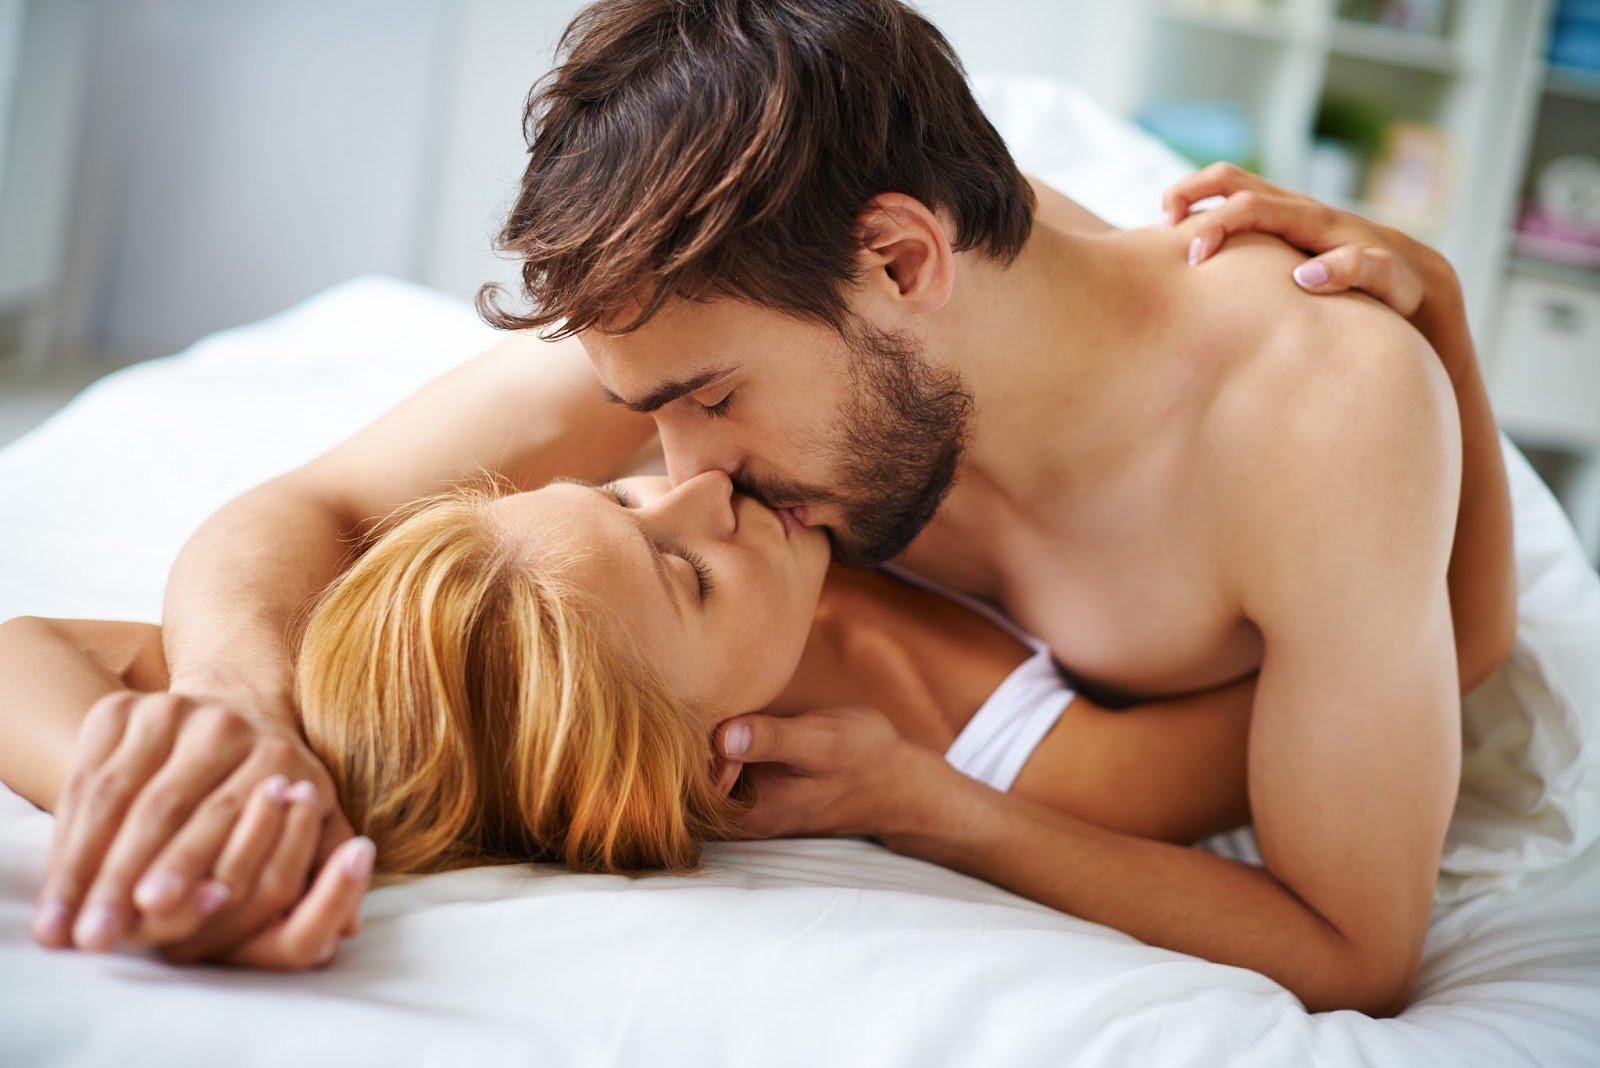 raunchy-intercoursevideos